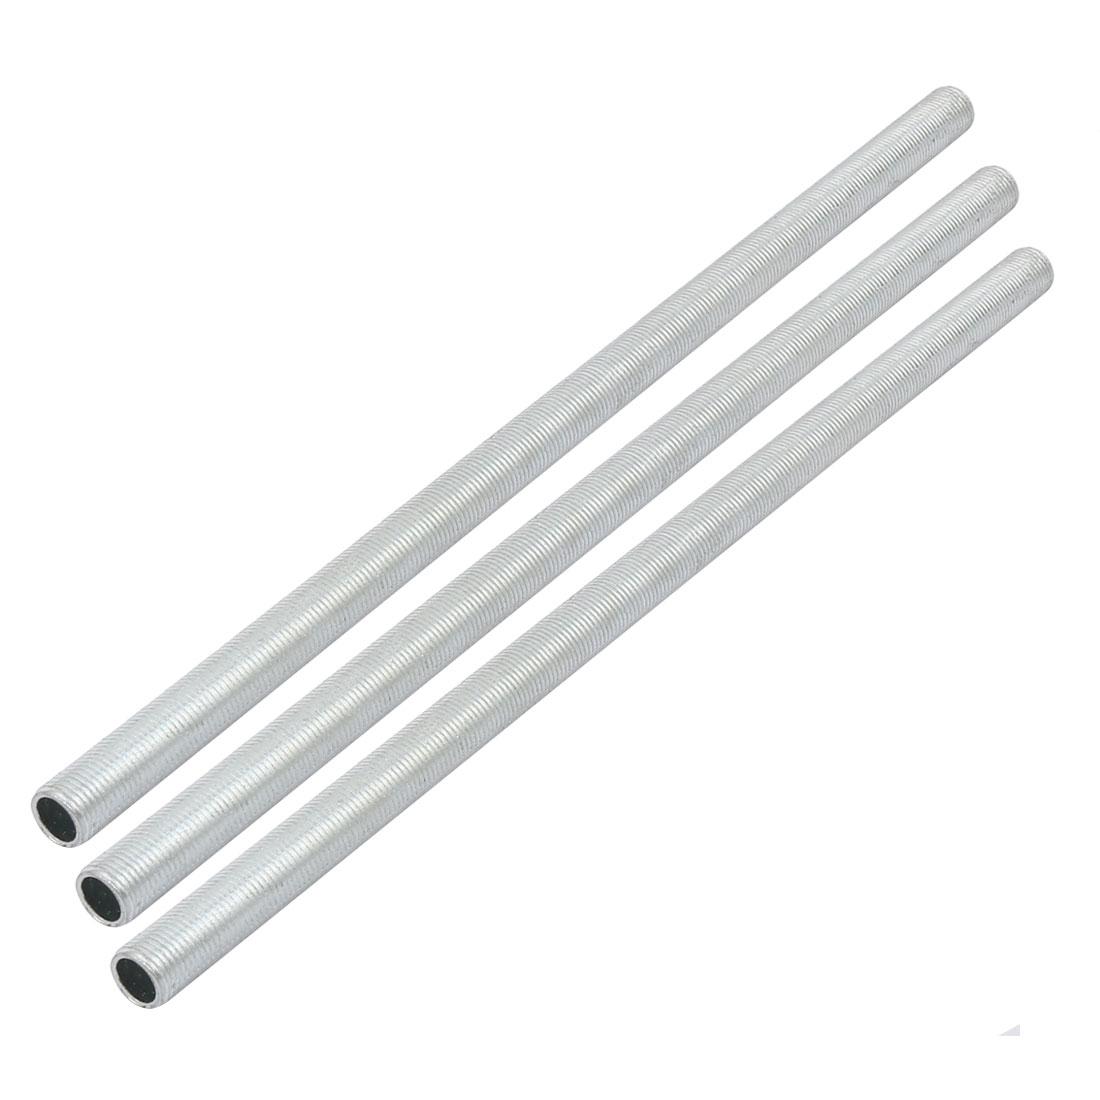 Metric M10 1mm Pitch Thread Zinc Plated Pipe Nipple Lamp Parts 240mm 3pcs